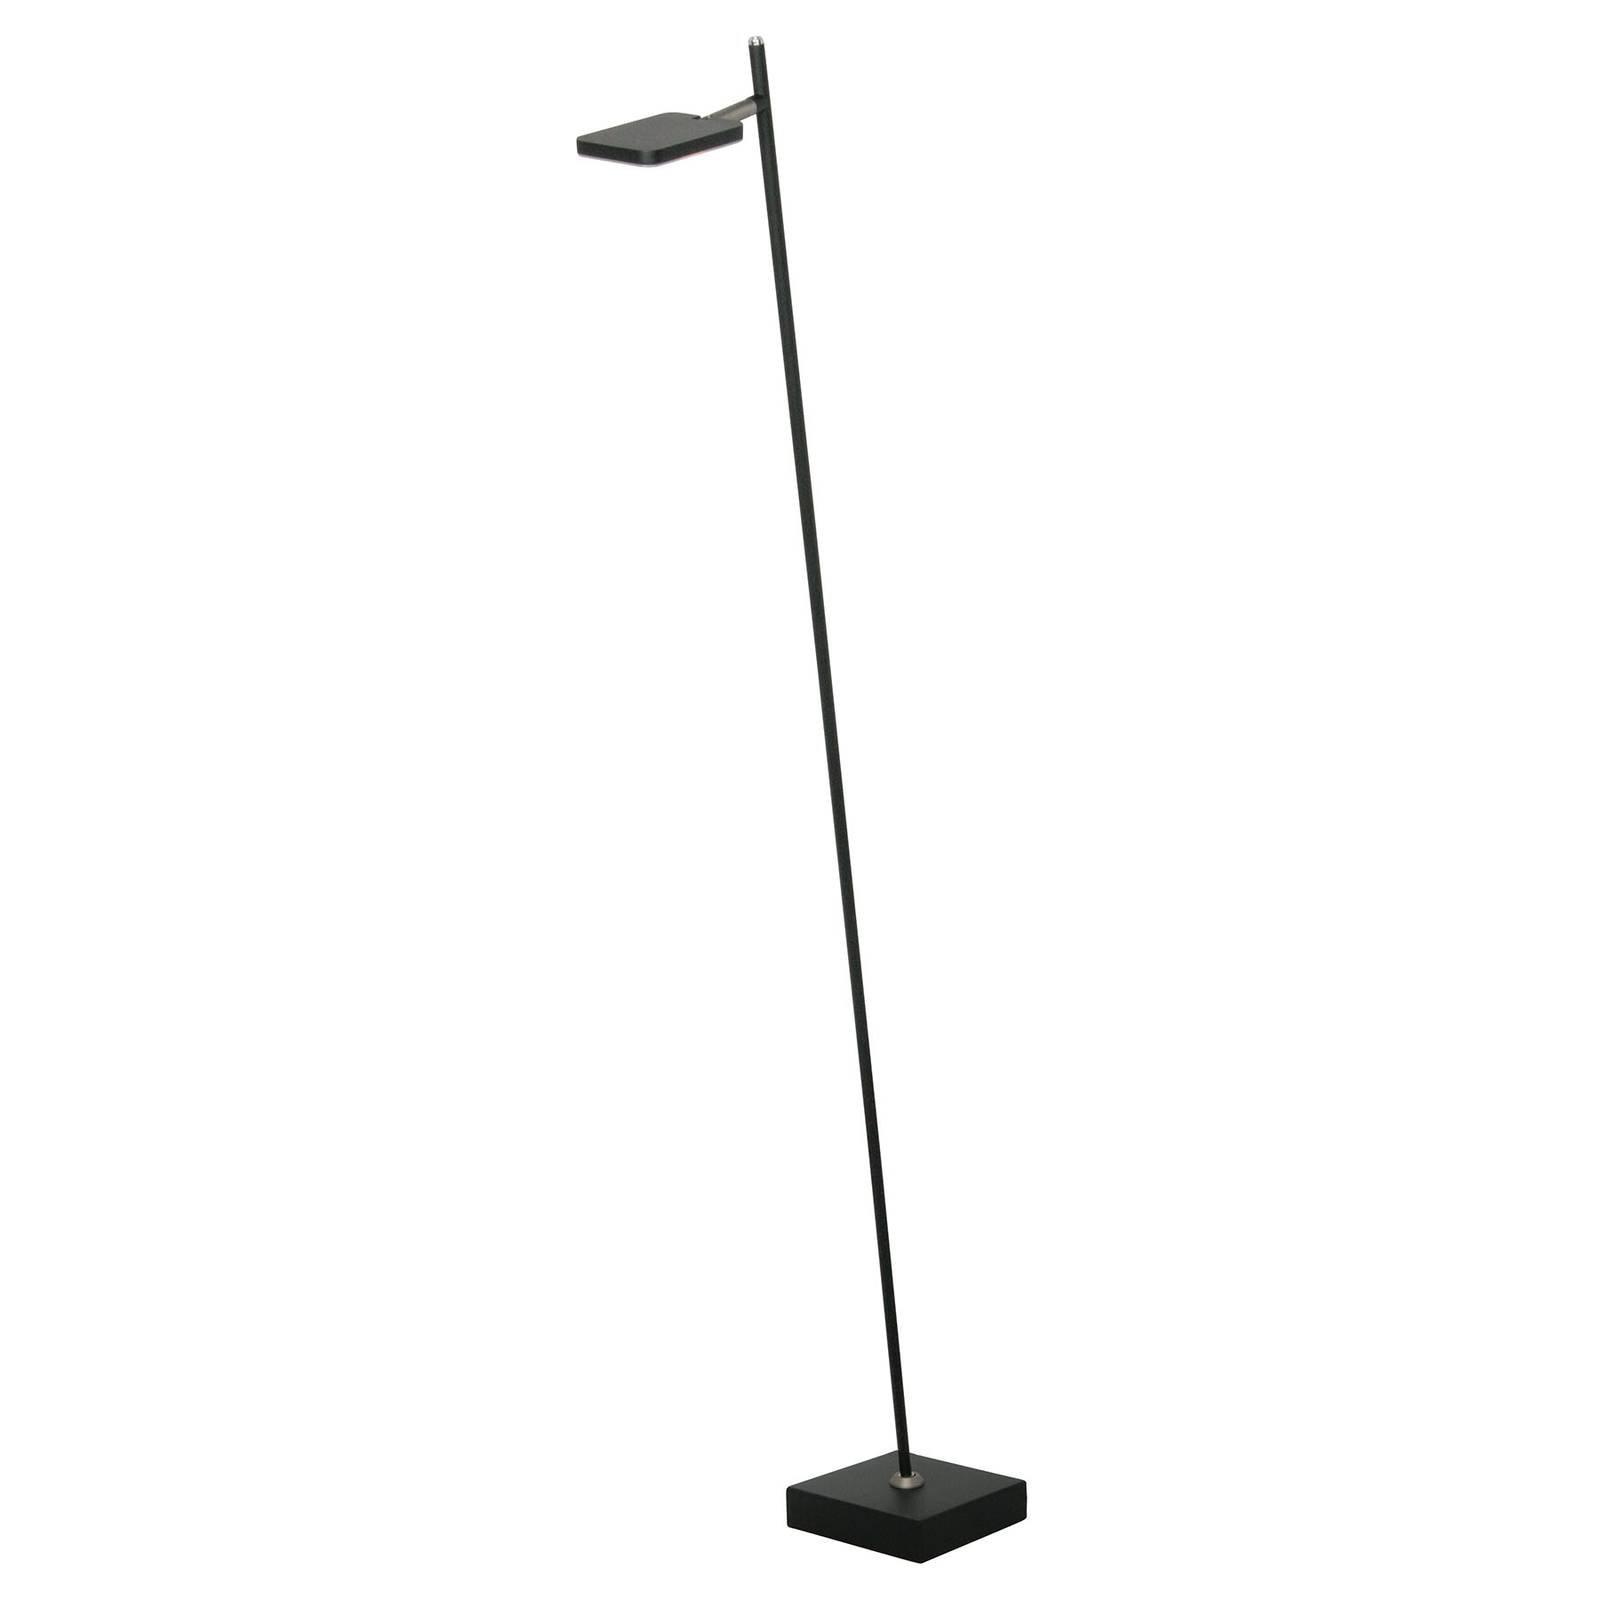 LED-gulvlampe Block, 1 lyskilde, svart